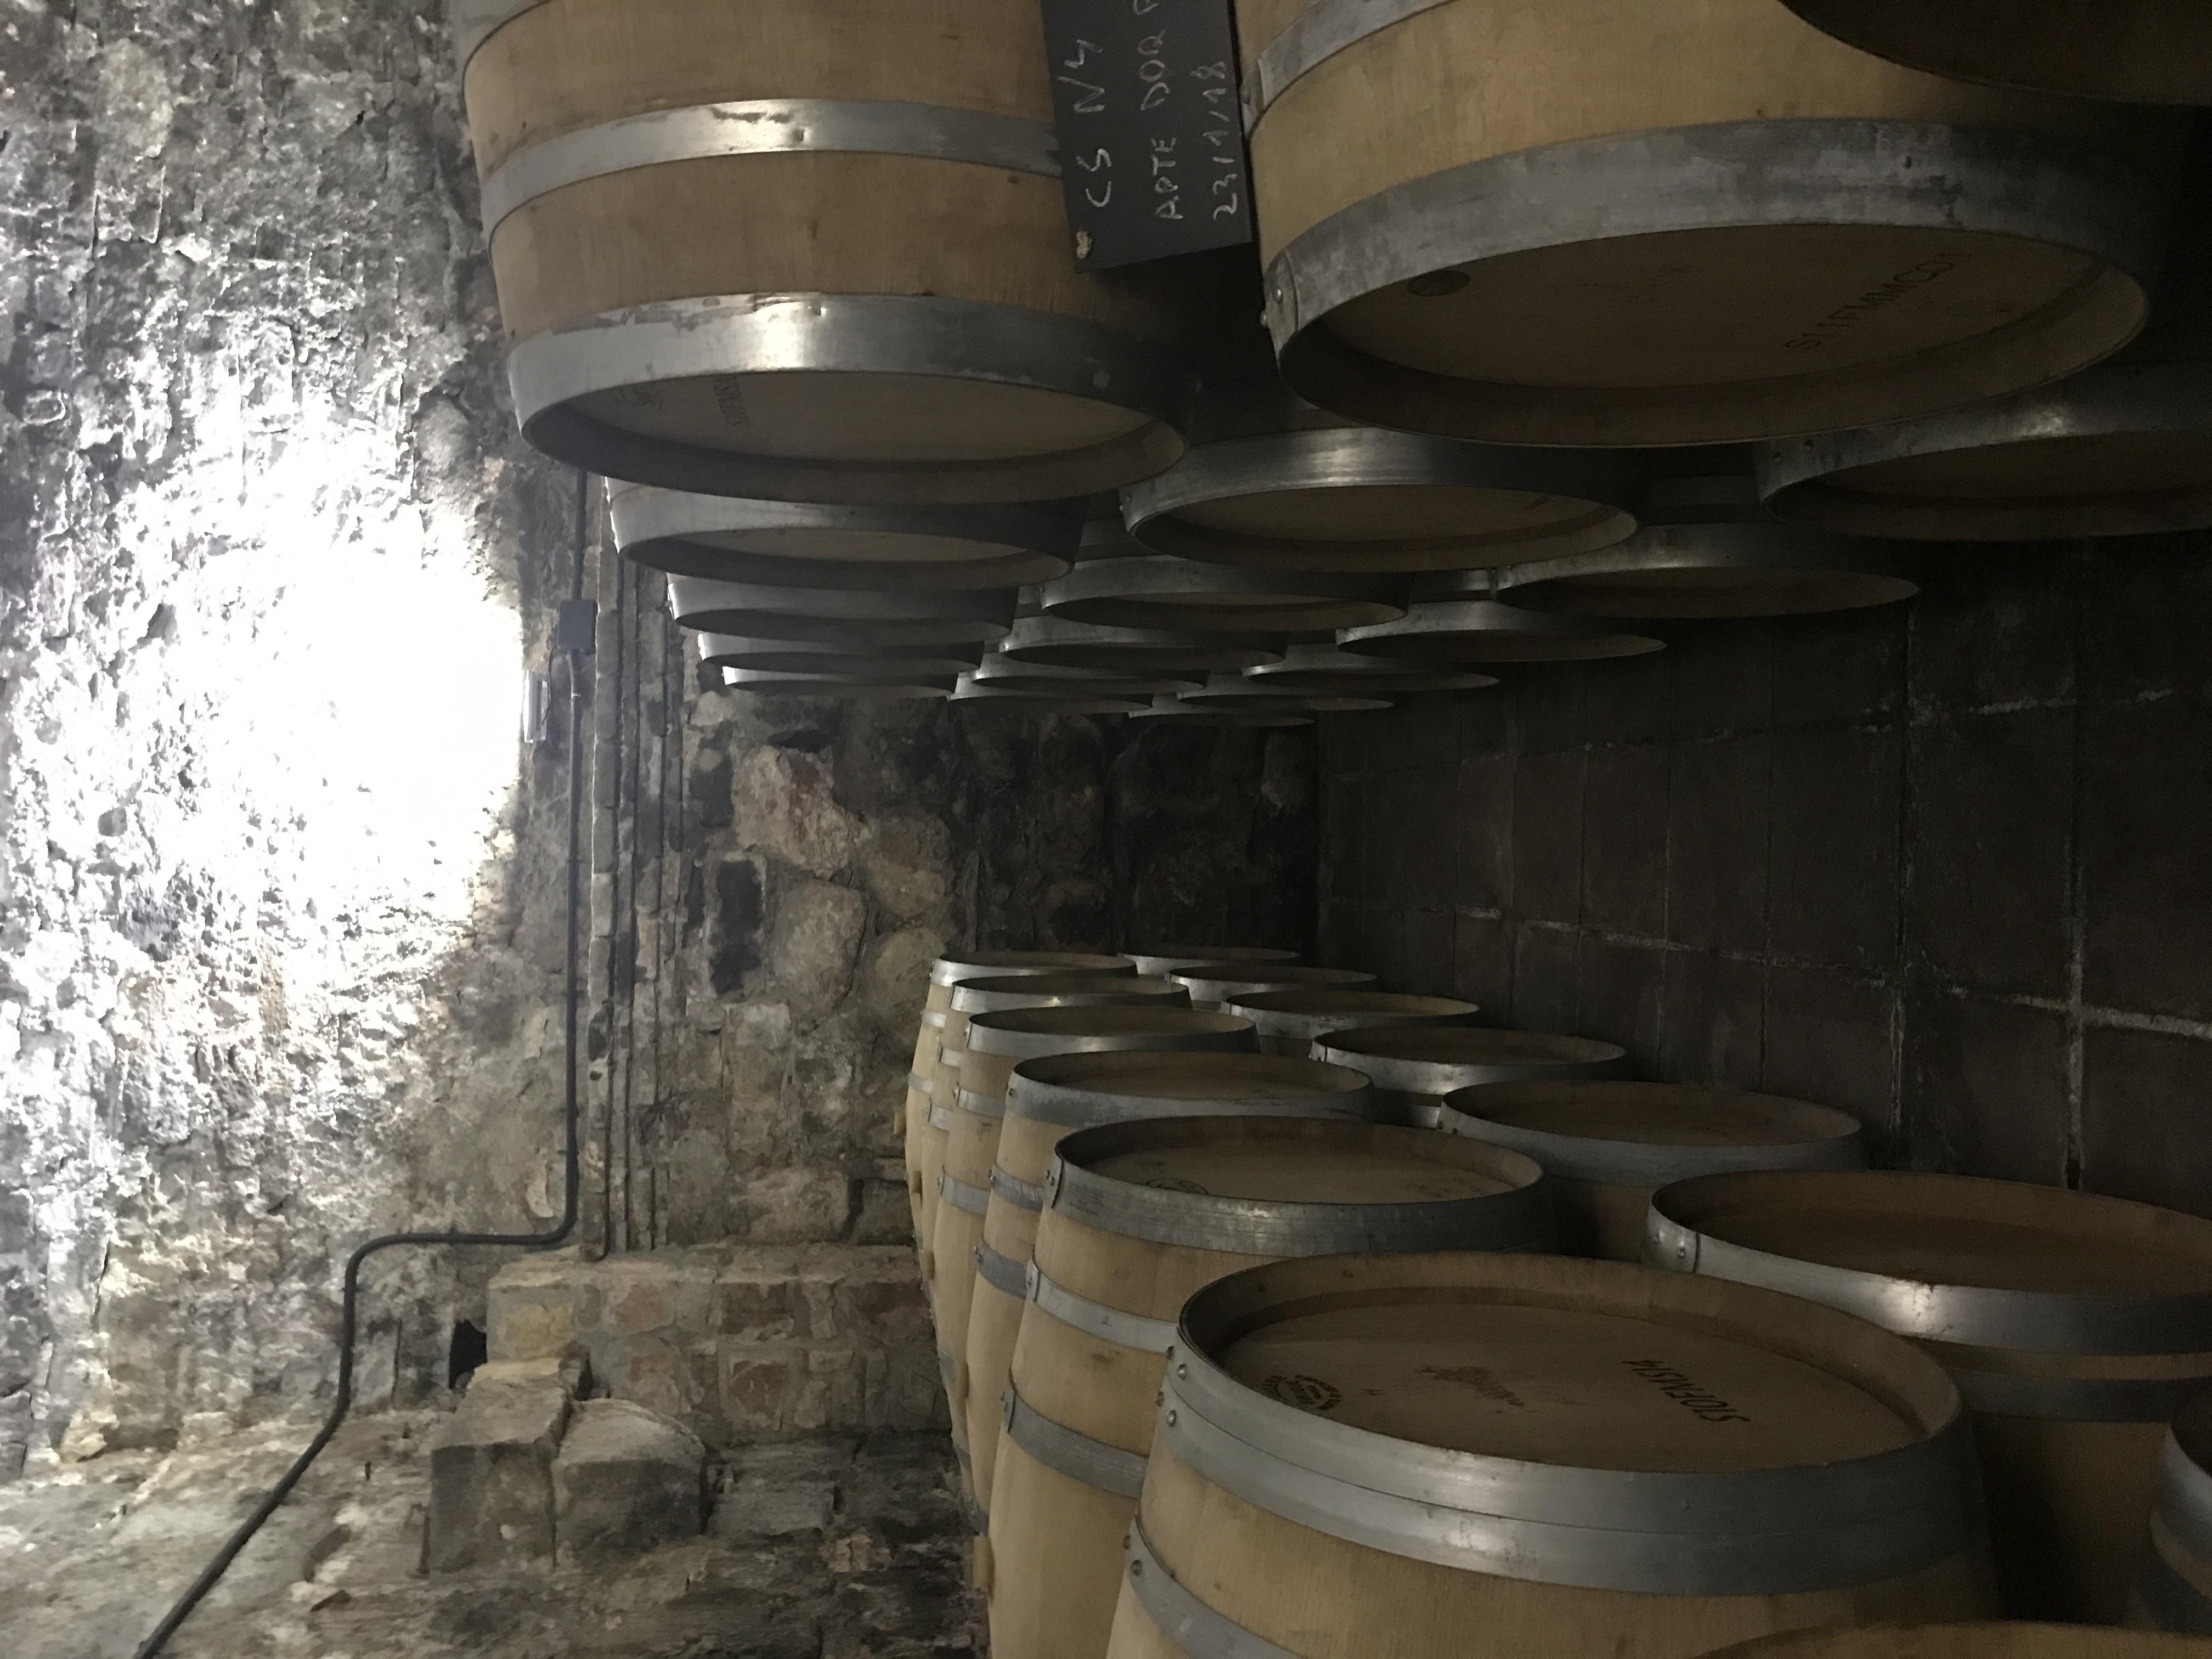 De aquí sale este fantástico vino que vamos a catar esta tarde.....